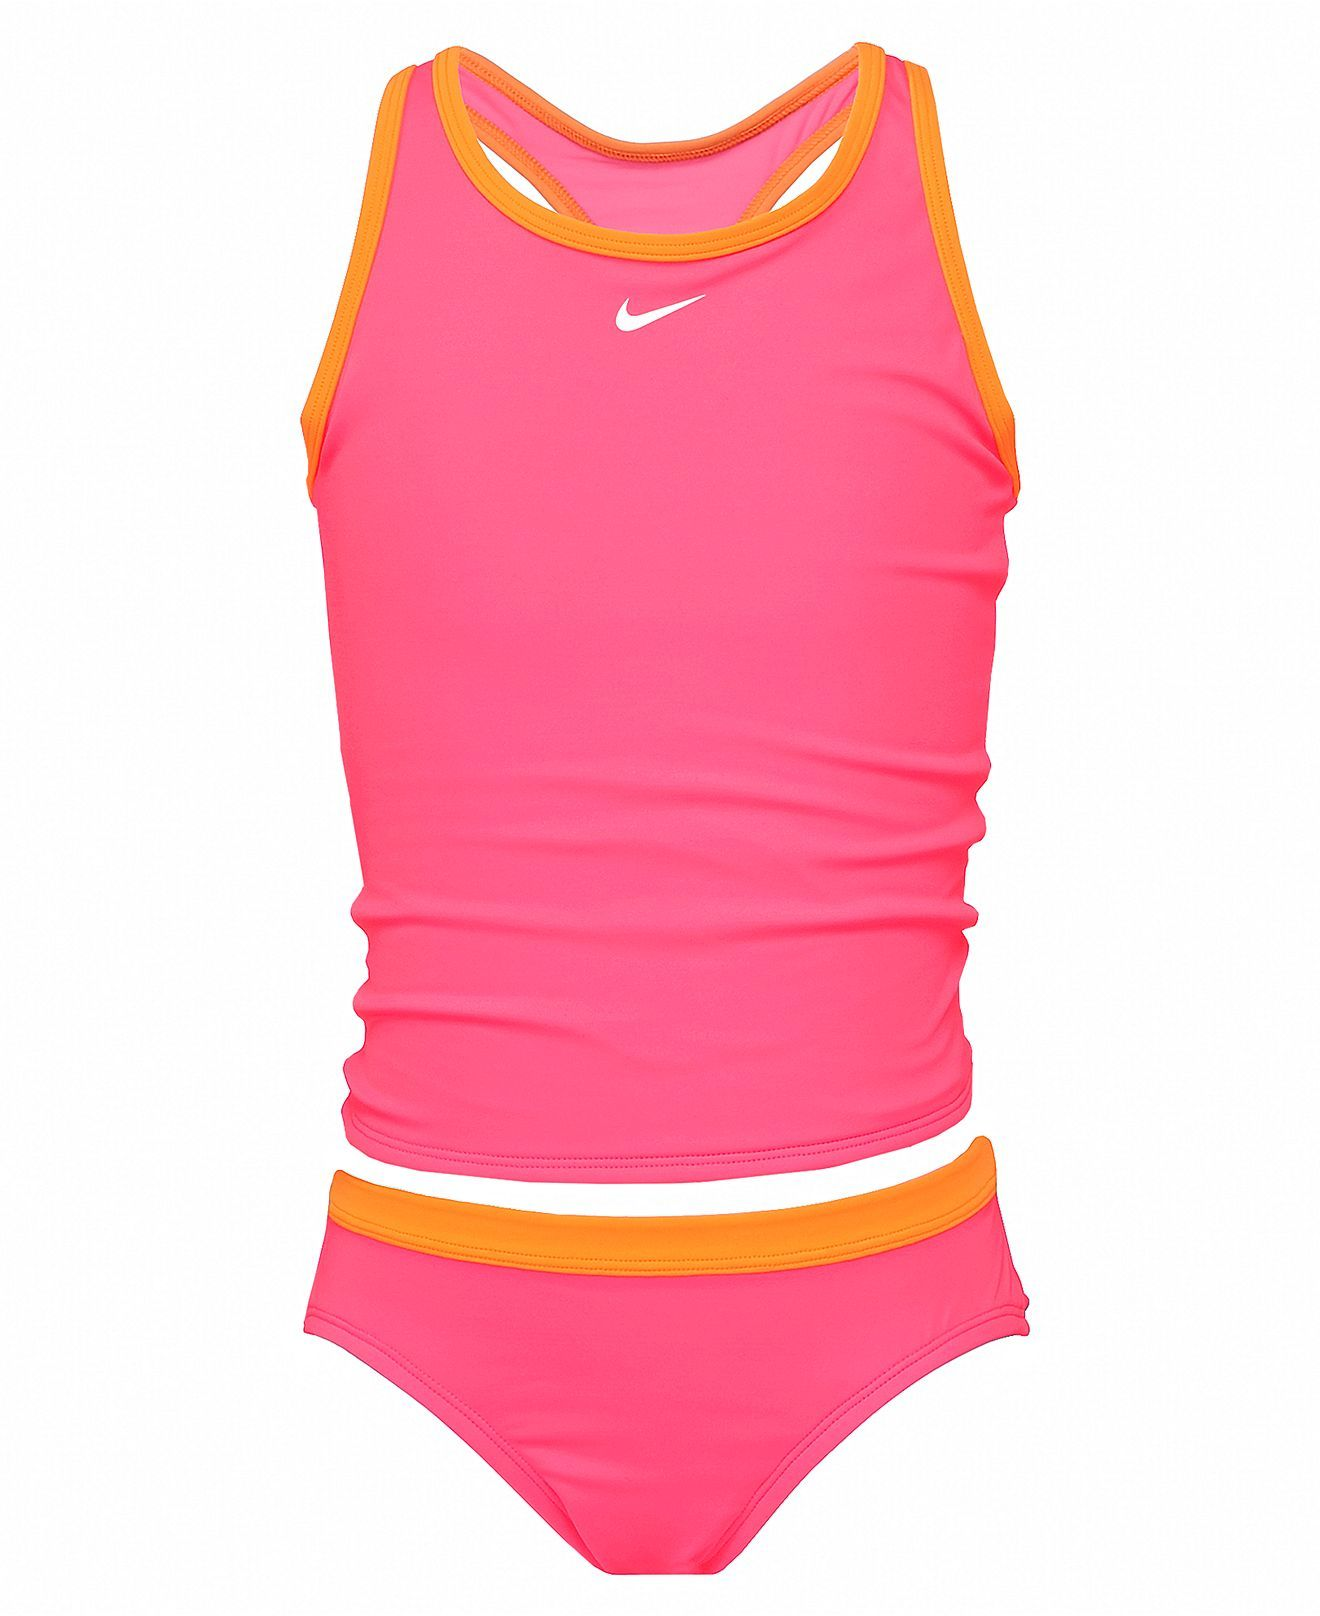 70bd1dcab6 Nike Kids Swimsuit